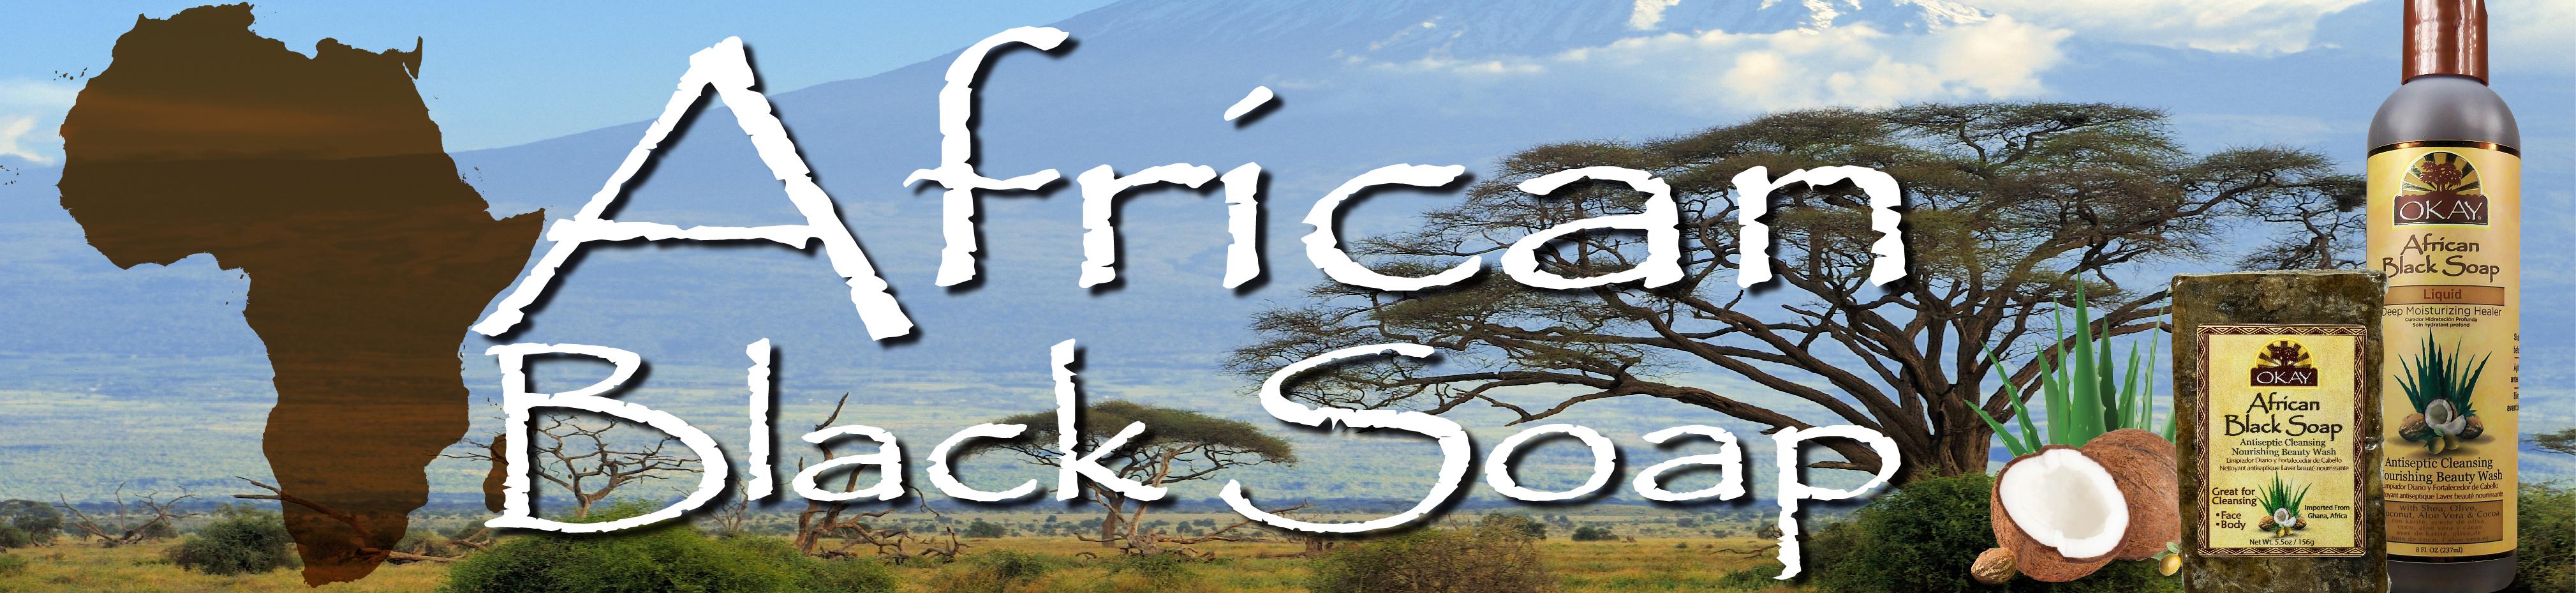 african-black-soap-01-01.jpg